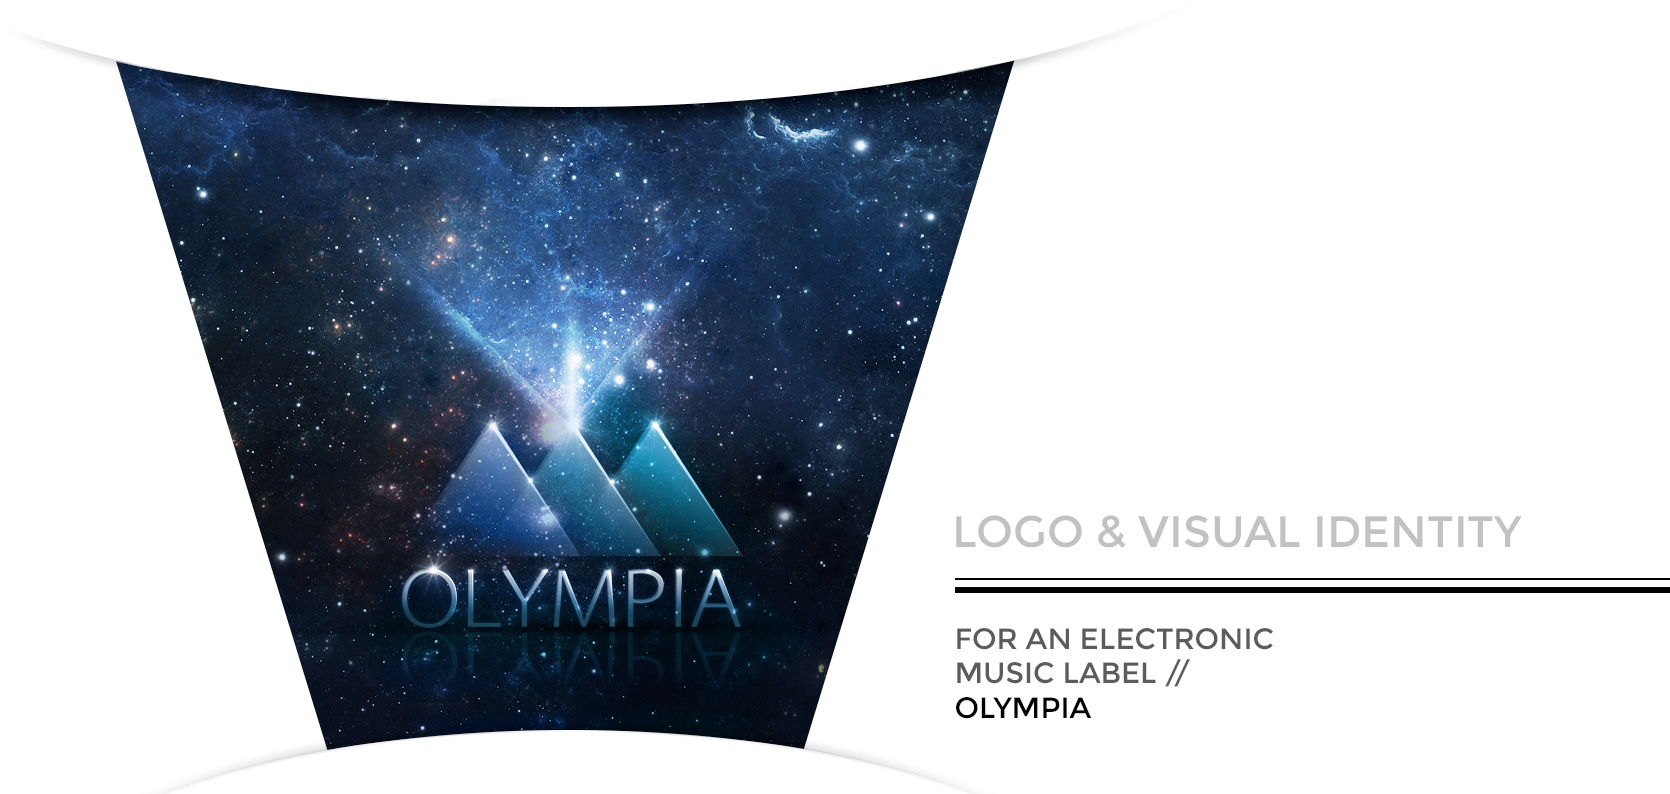 olympia logo agence montreal agency montréal